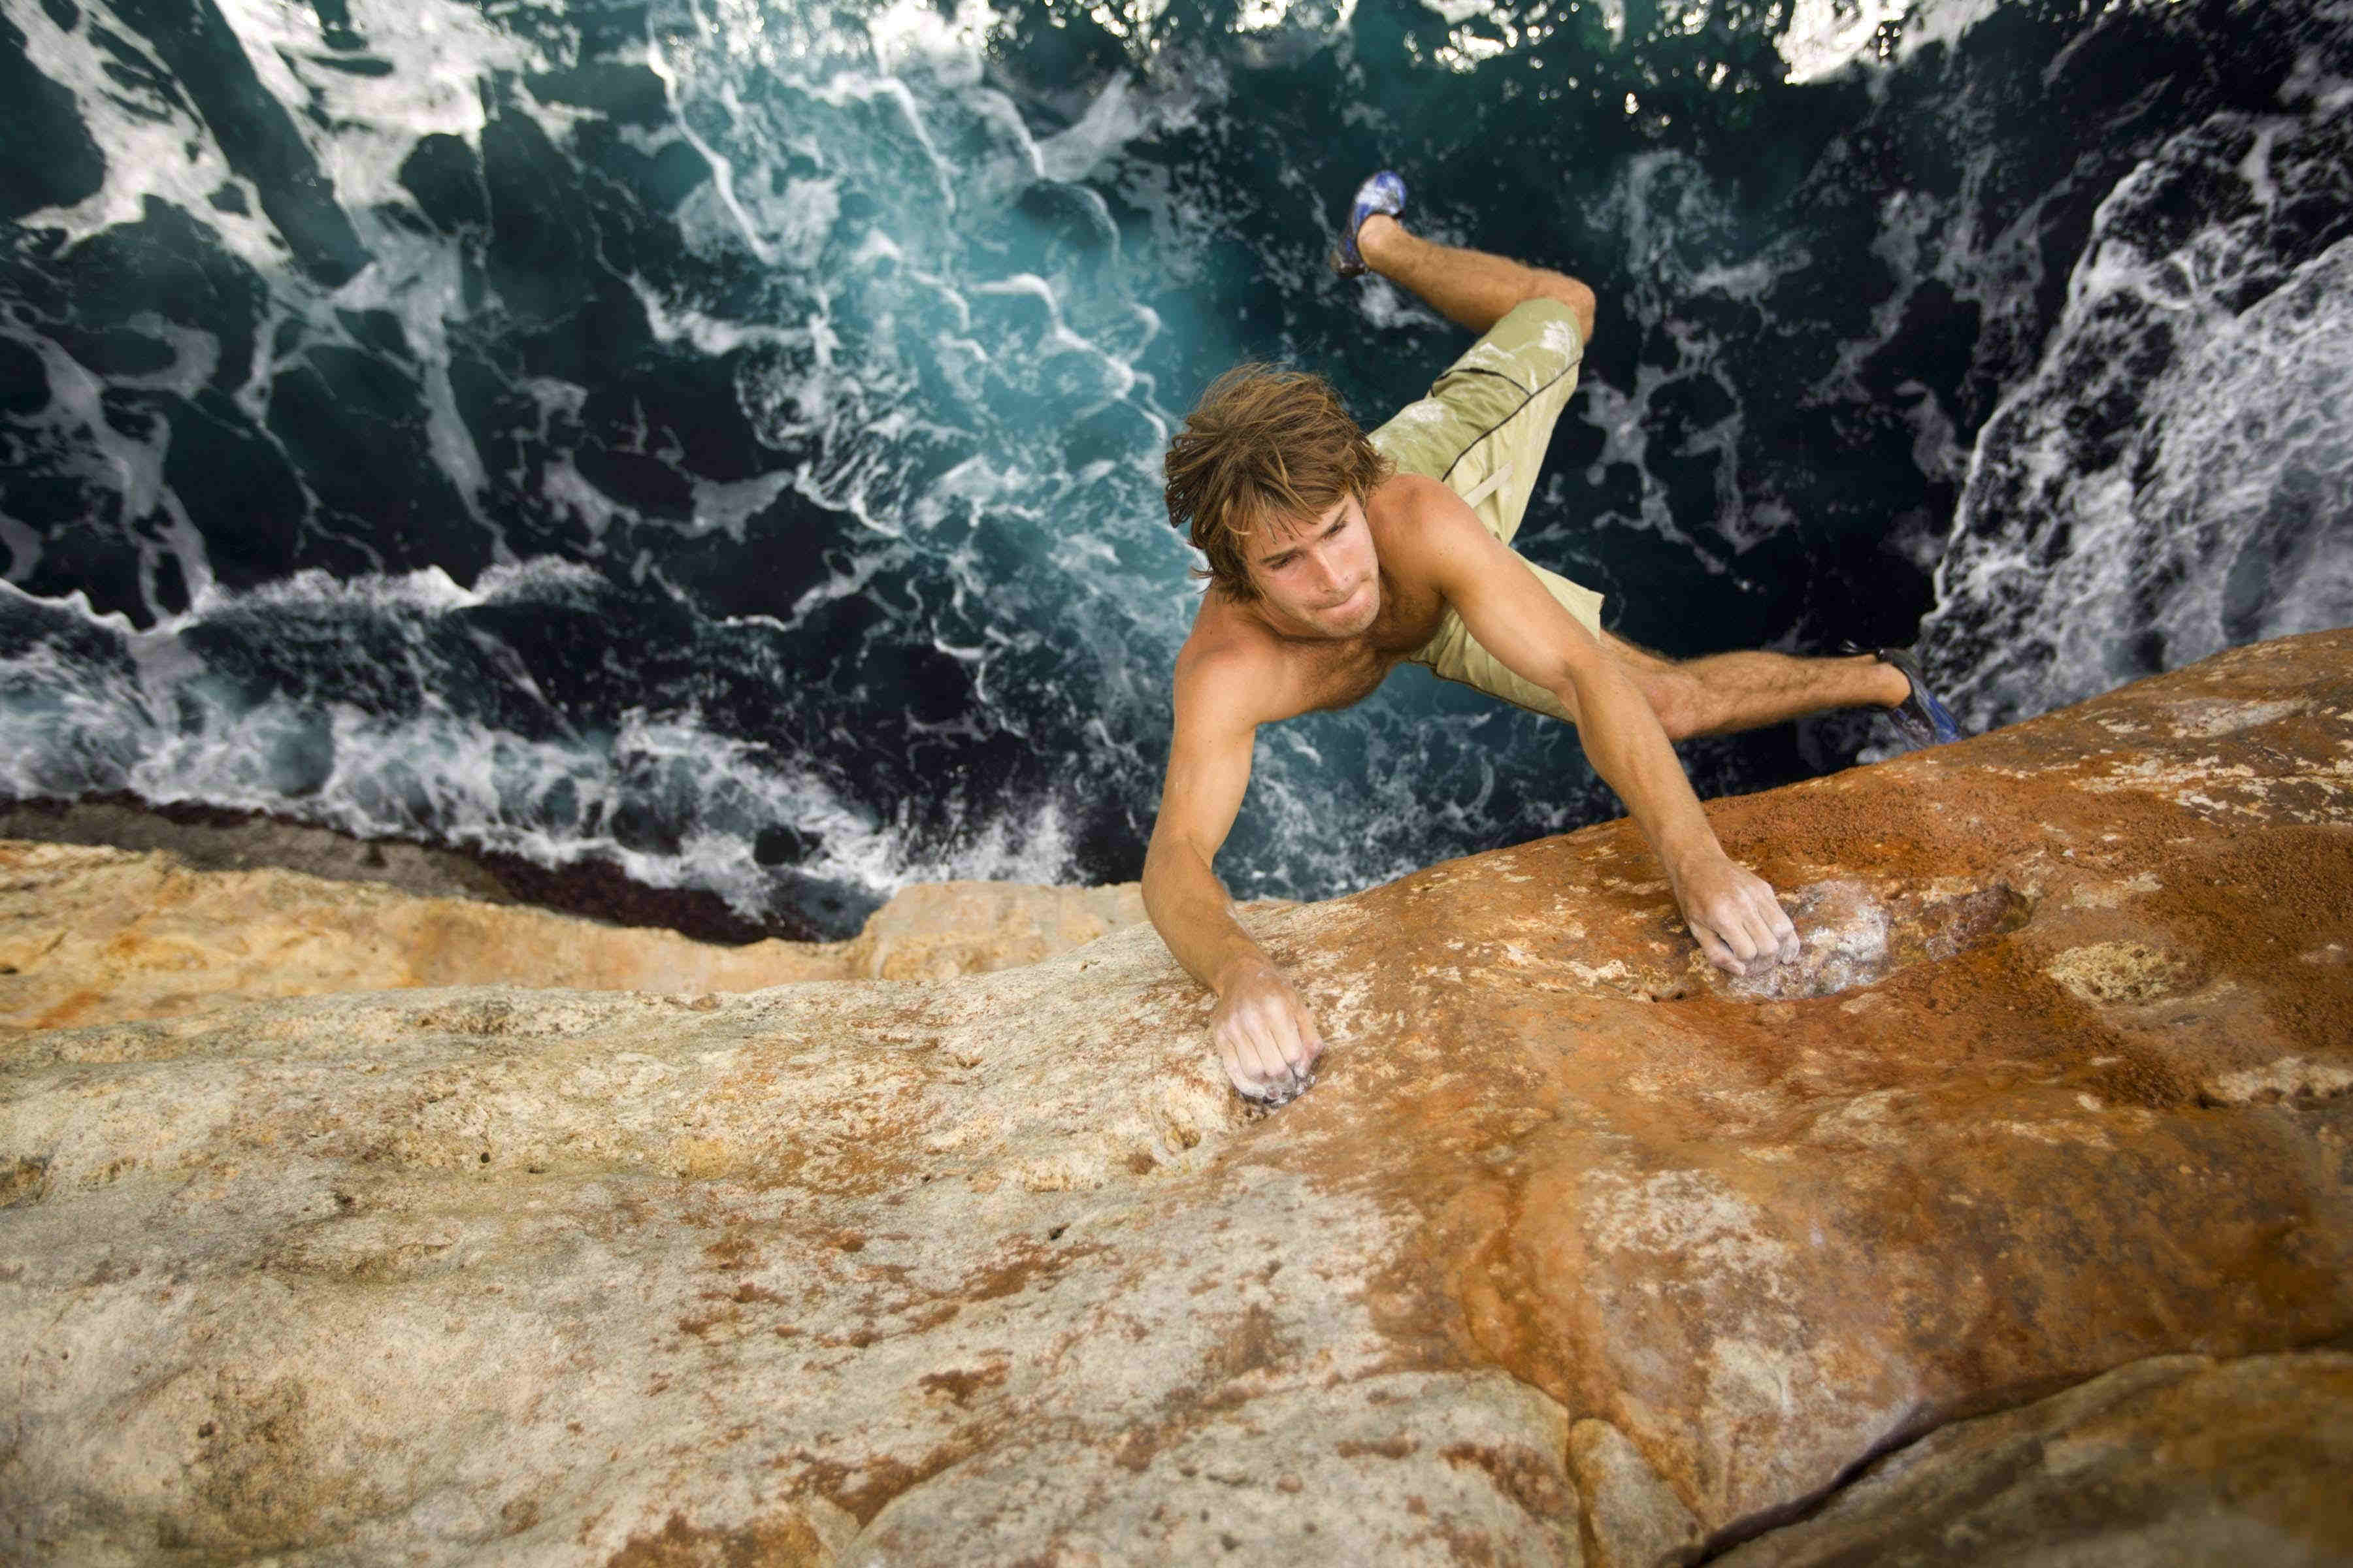 Chris Sharma beim Deep Water Soloing in Mallorca. Er rief 2013 den Psicobloc-Wettkampf ins Leben.